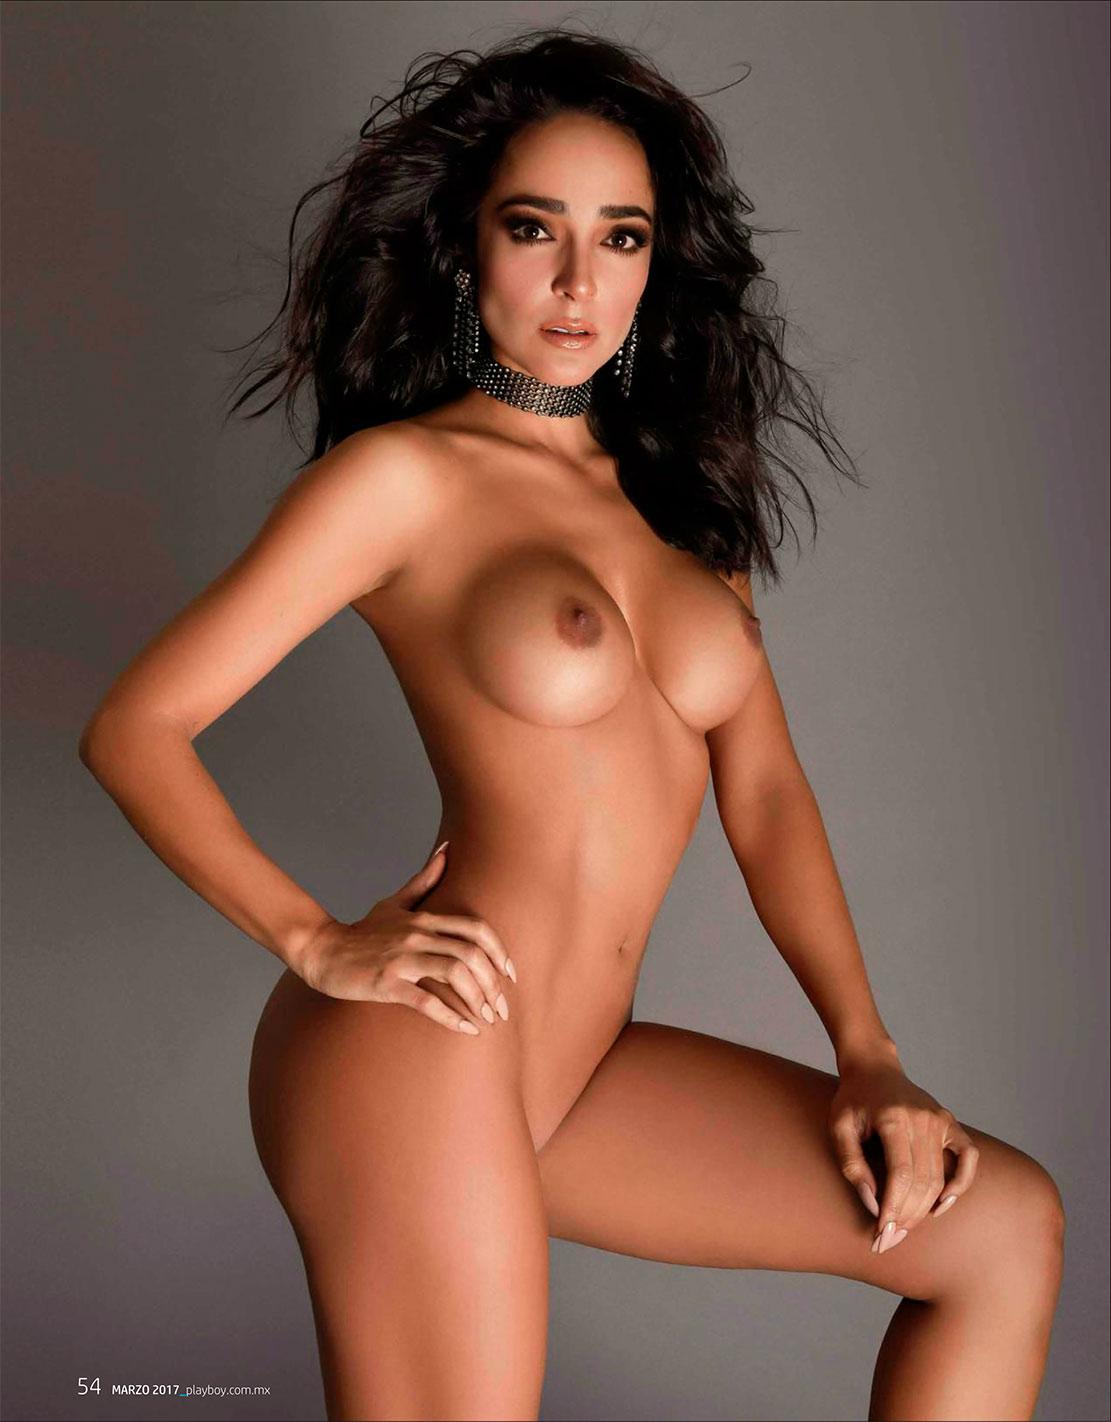 Veronica rodriguez latina from venezuela 8